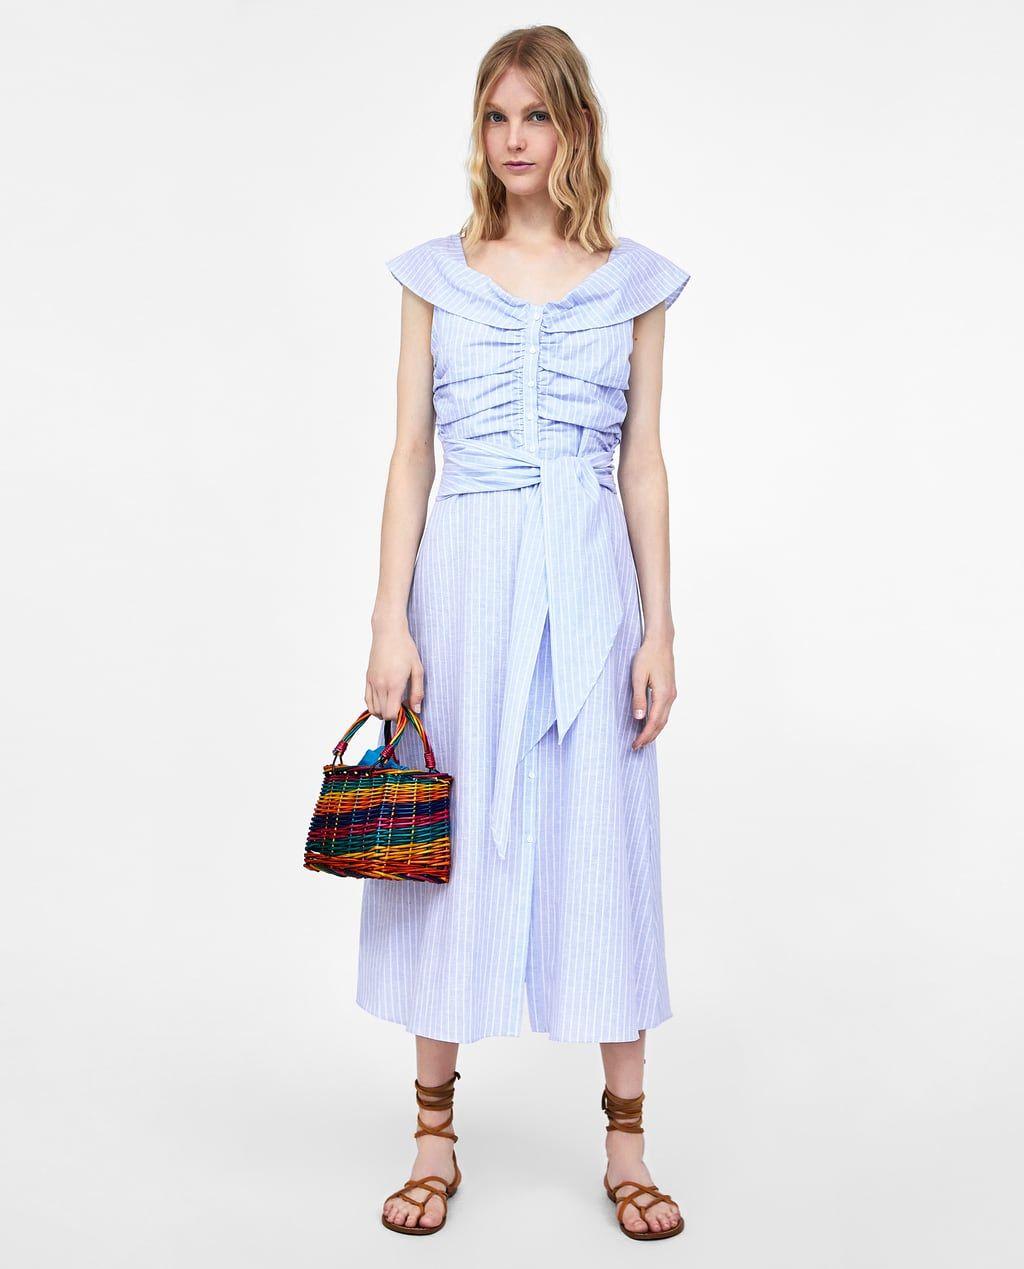 zara - woman - striped off-the-shoulder dress | zara kleider